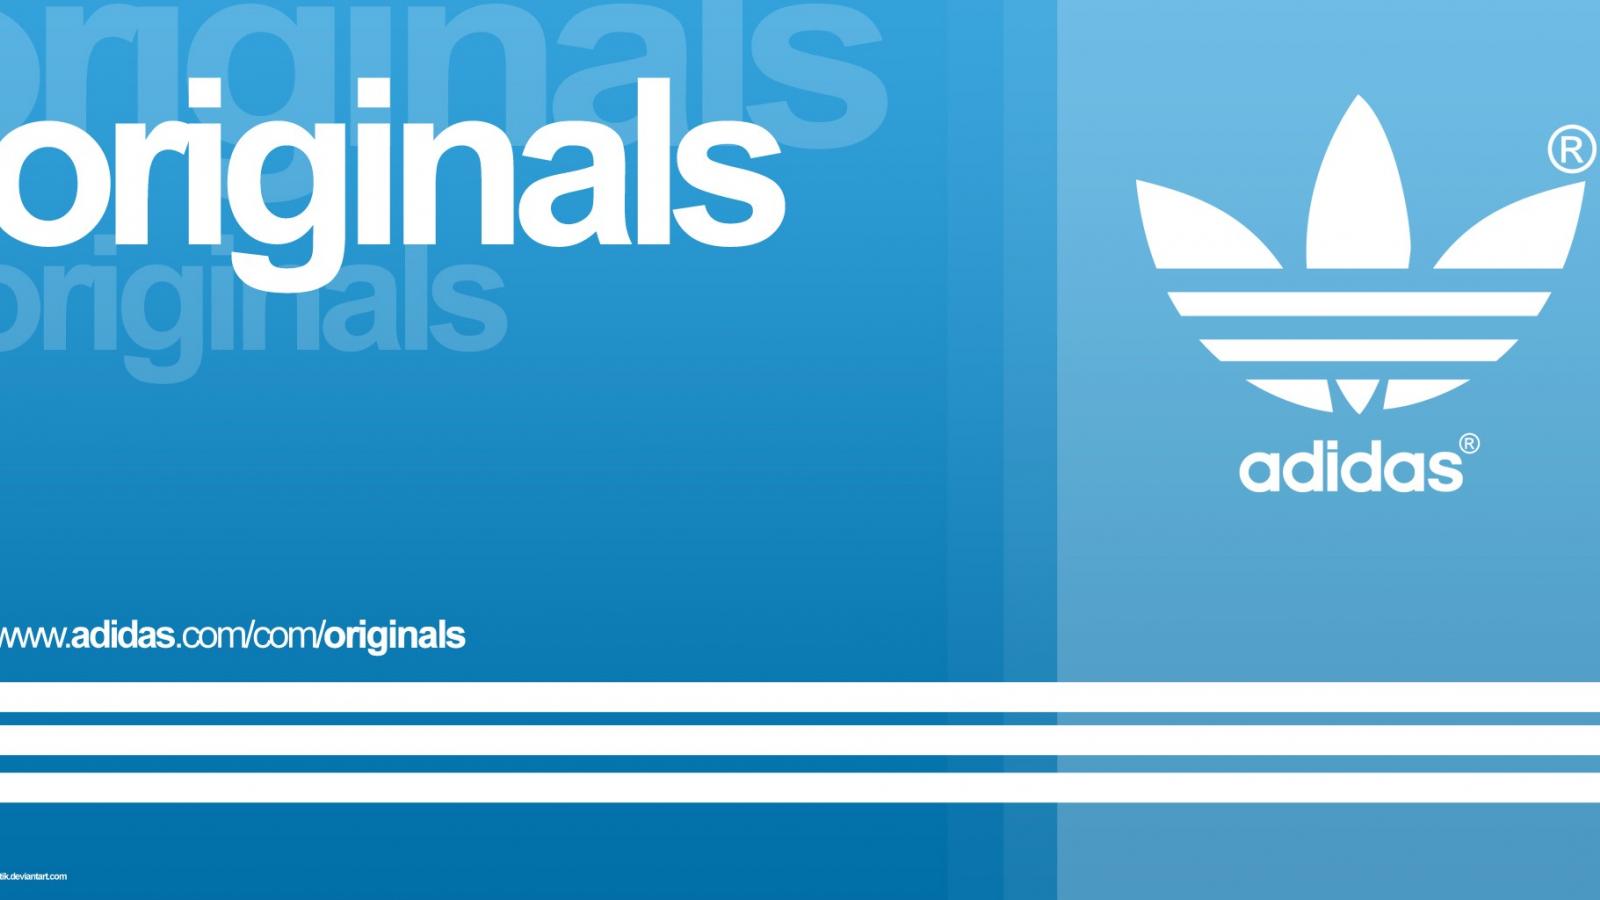 Free Download Adidas Originals Wallpaper Adidas Originals Iphone